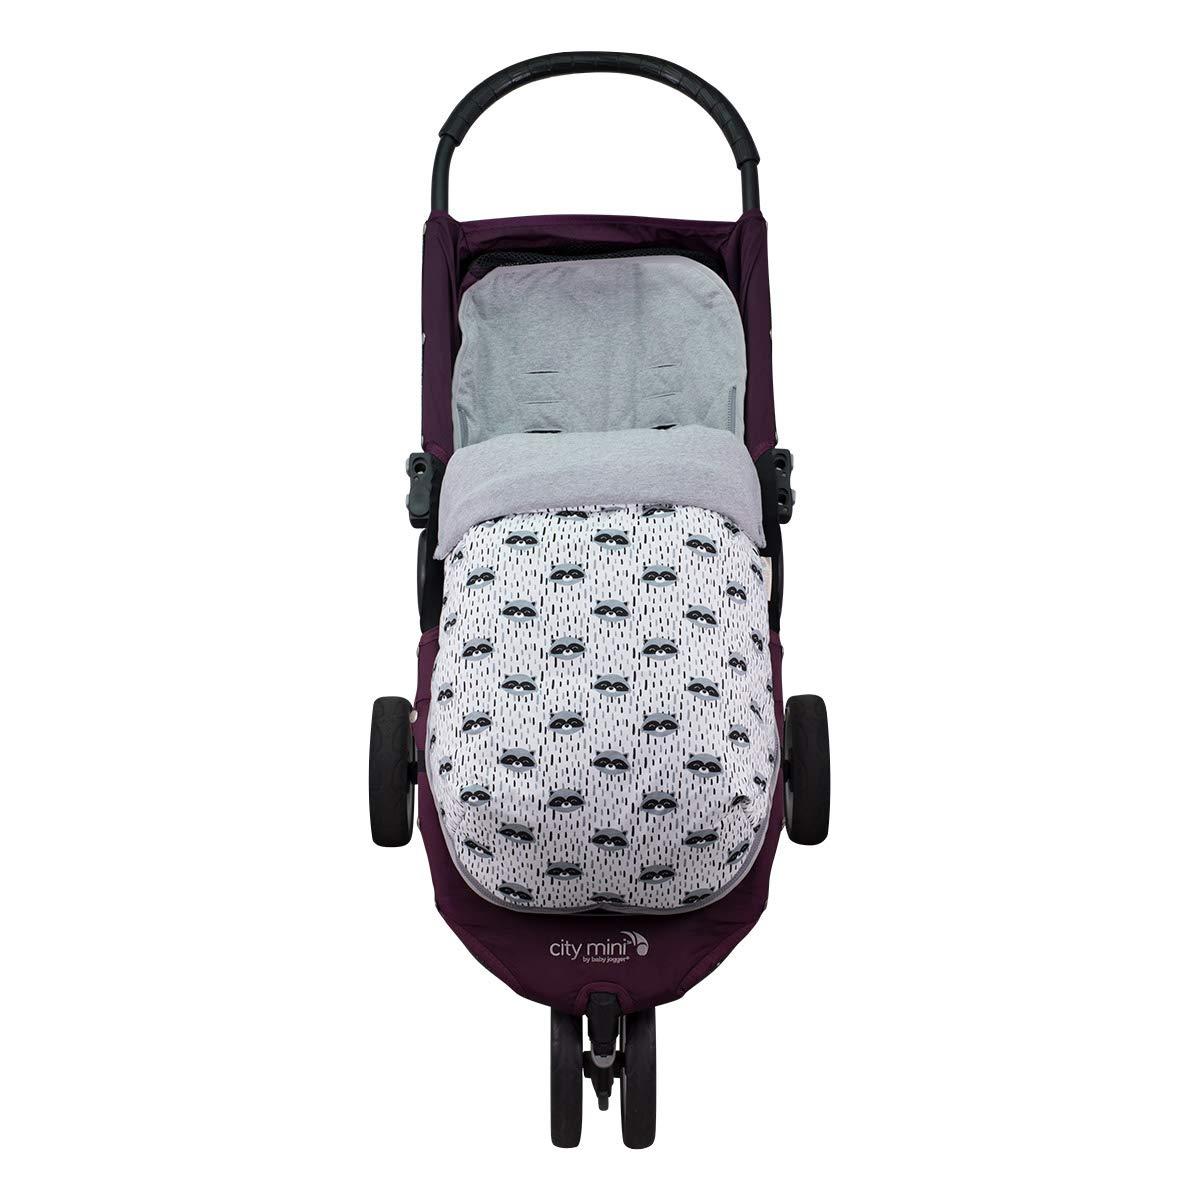 Janabebé Footmuff Baby Sack Jogger City Mini Pushchairs (Raccoon, Cotton)